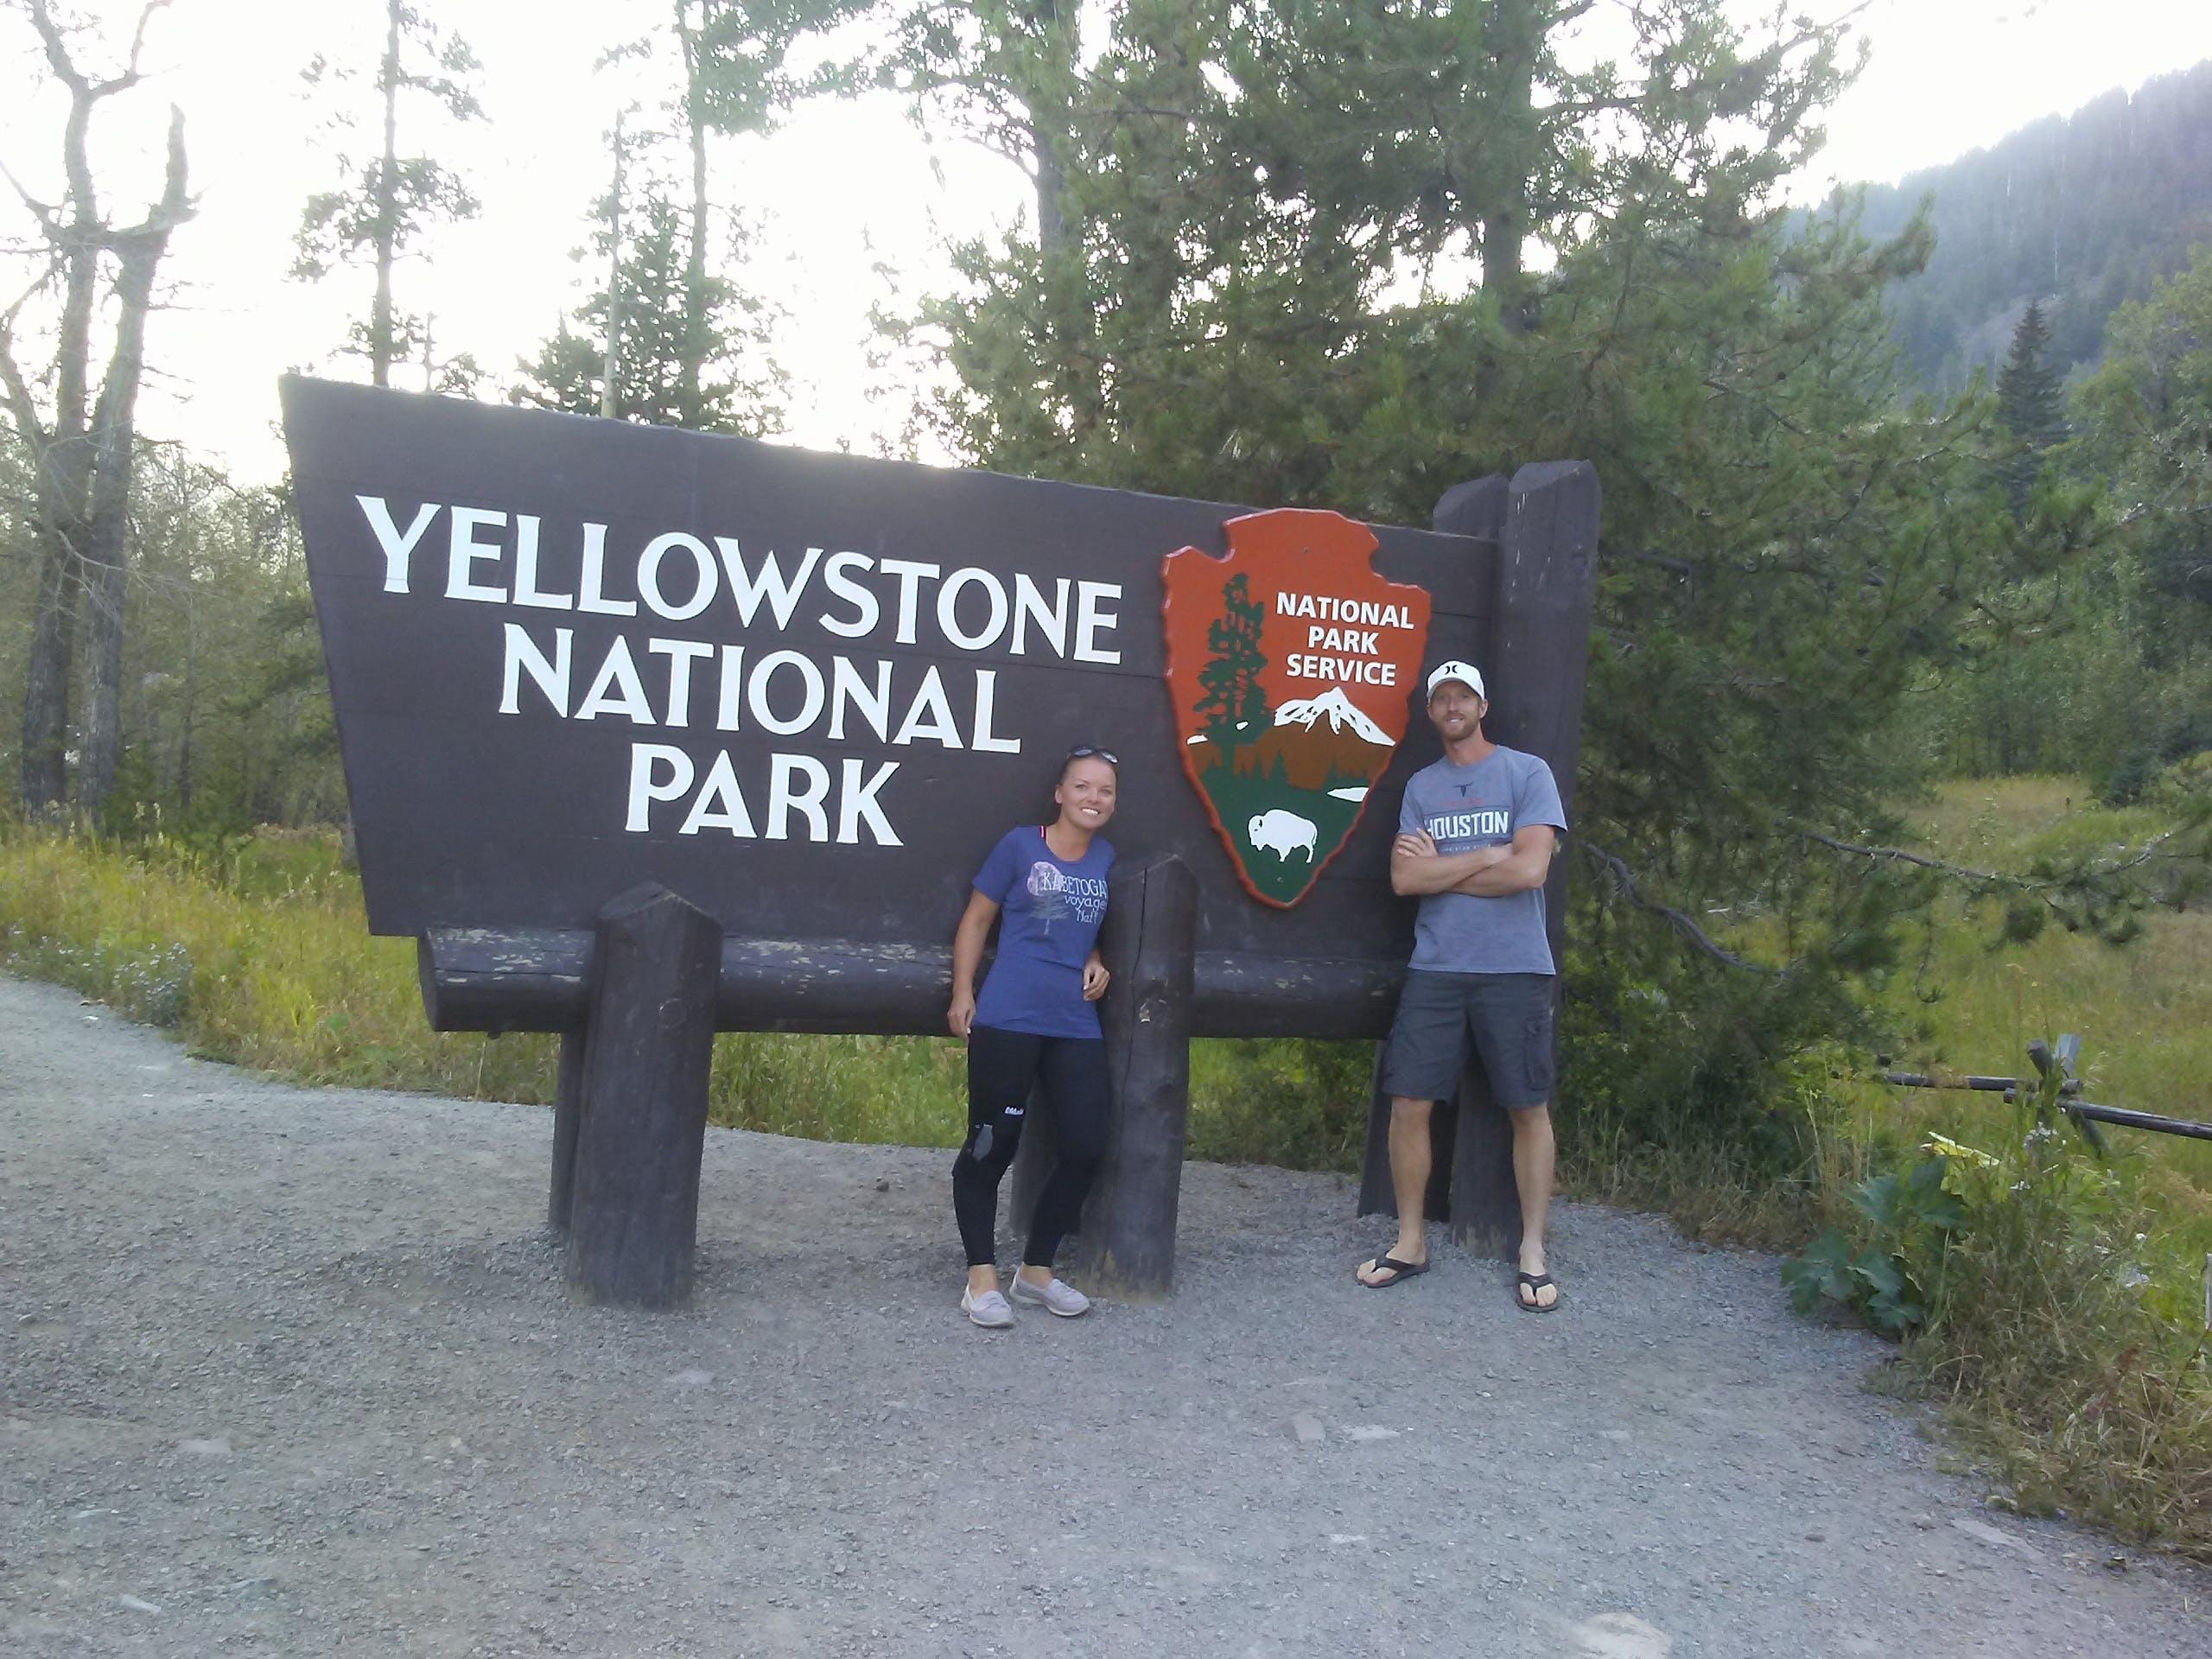 Rv hookup yellowstone national park